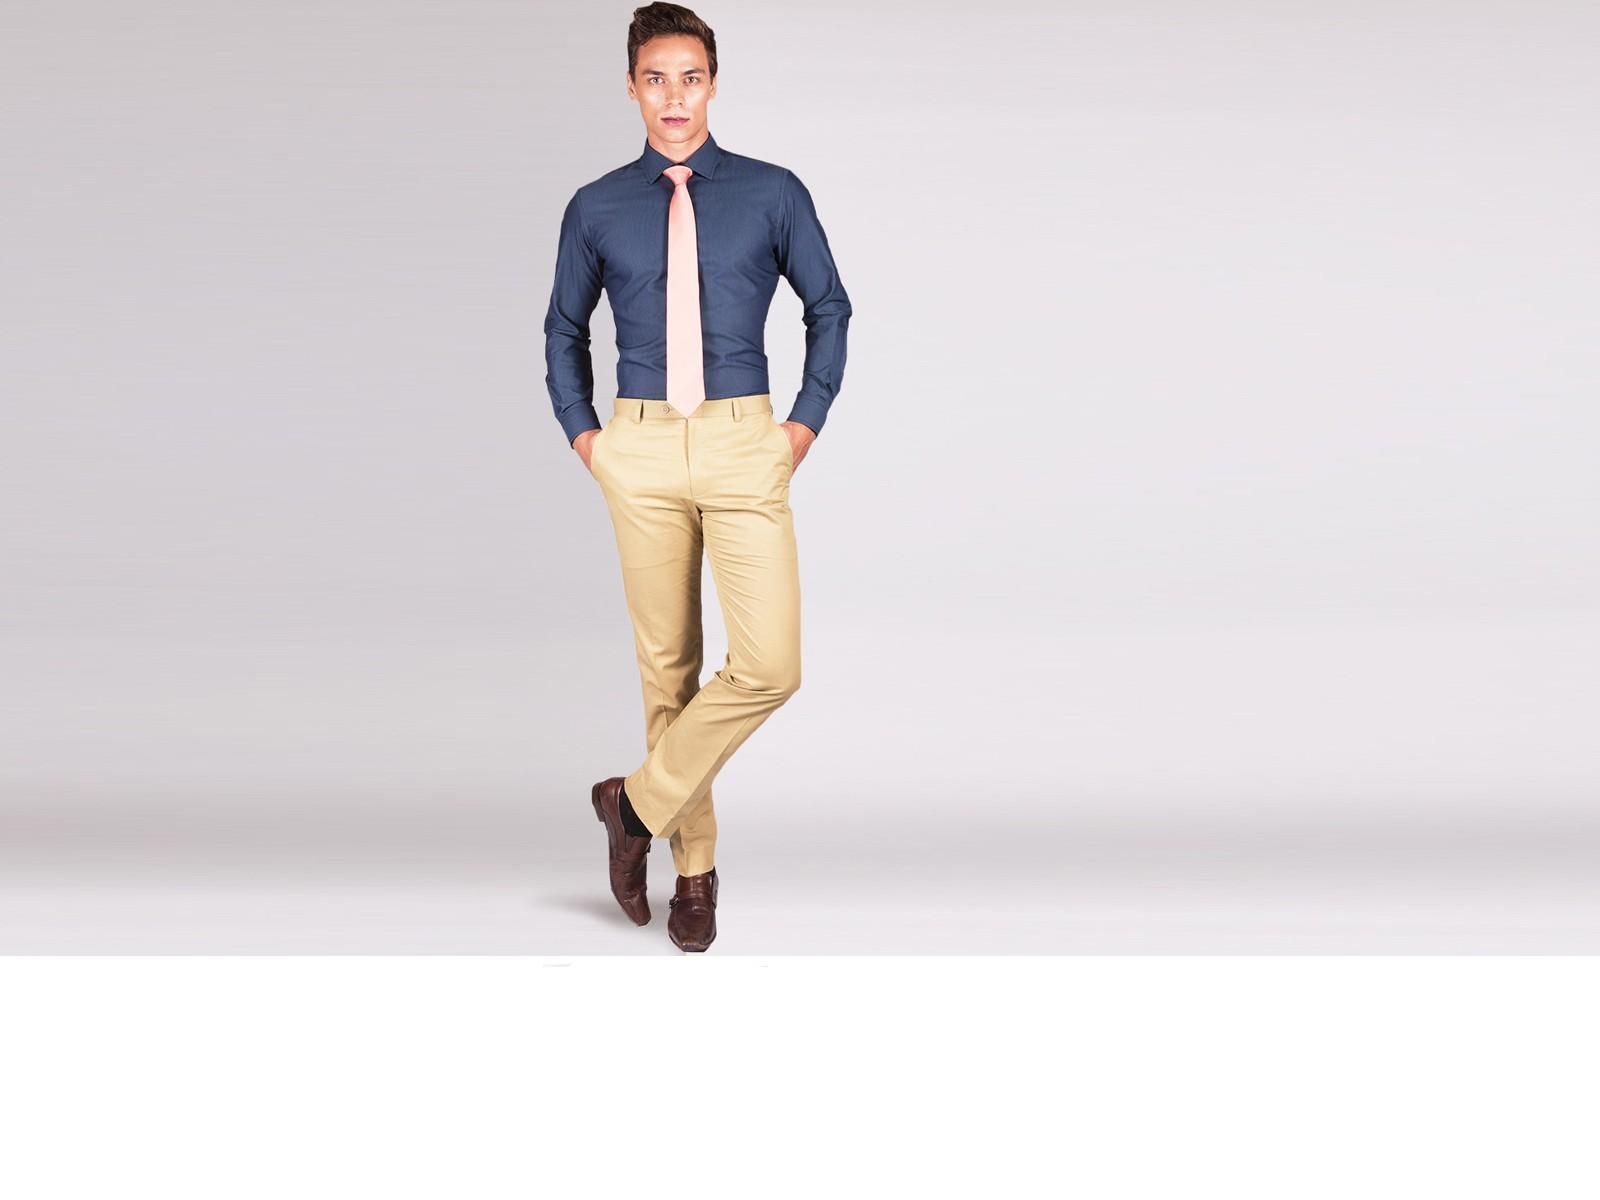 Premium Pinpoint Charcoal Grey Custom Shirt